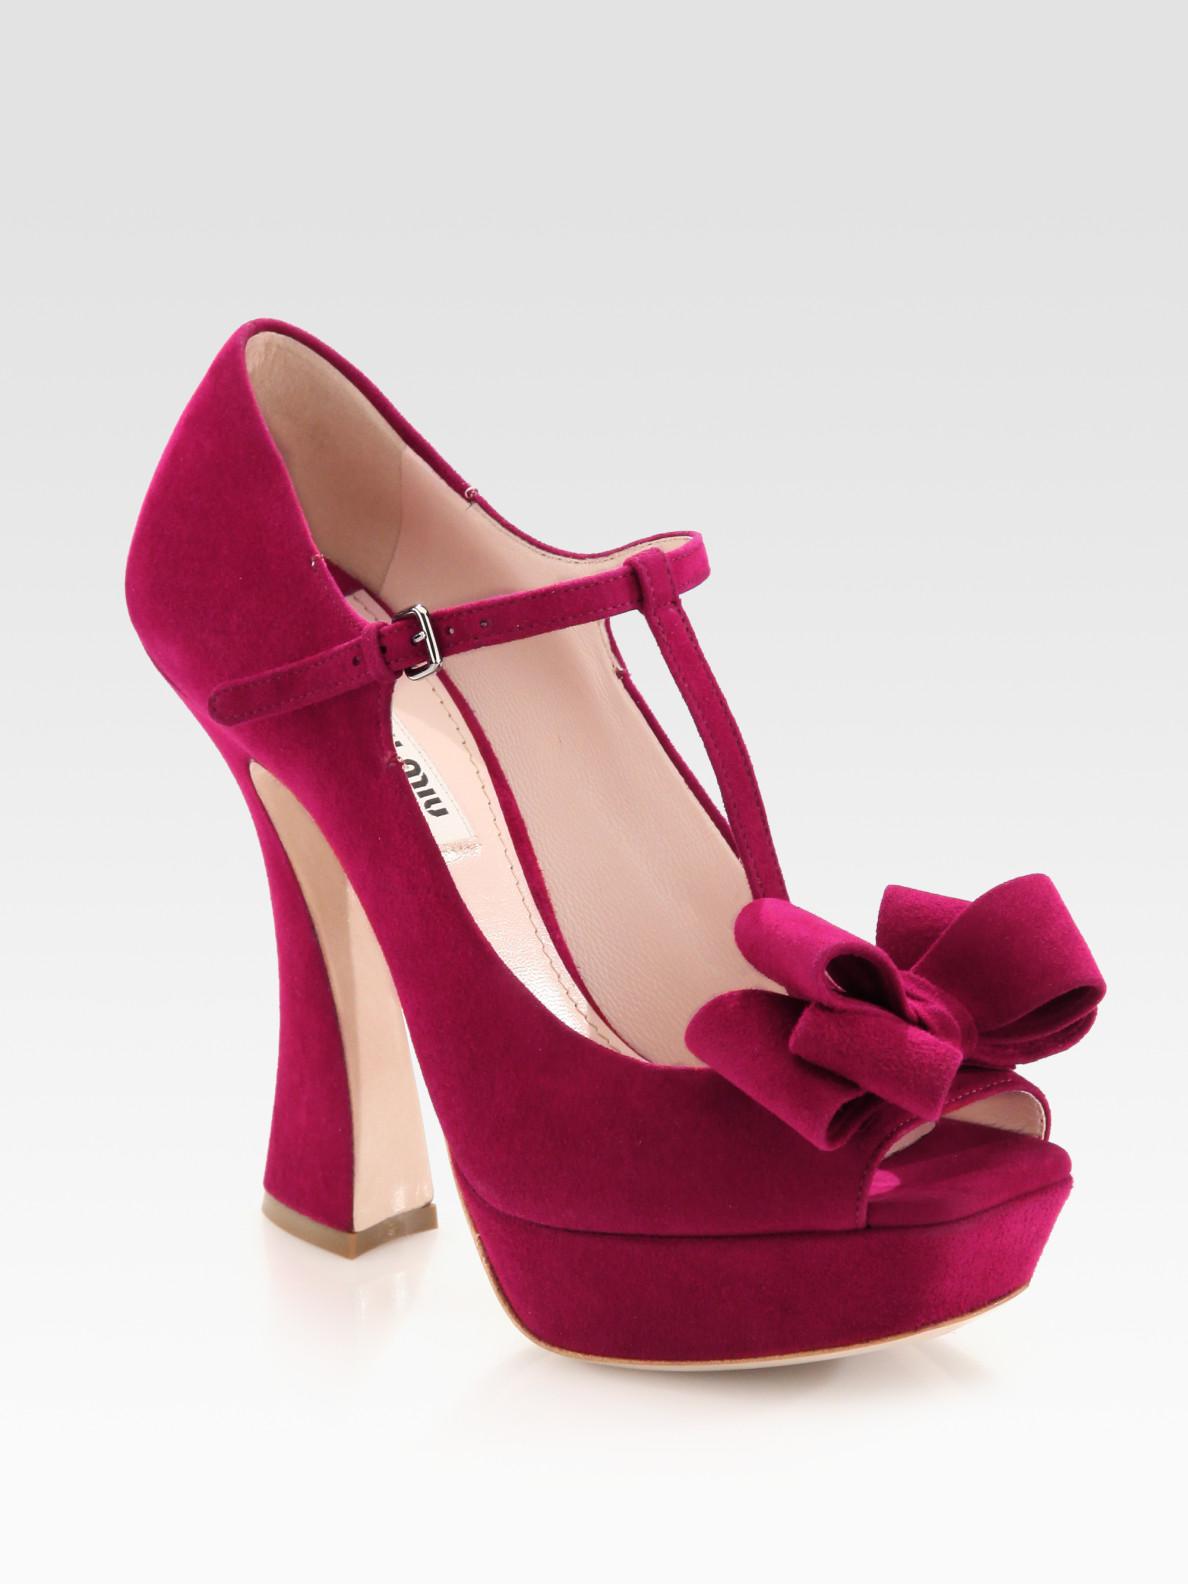 fe2577f9f02 Lyst - Miu Miu Suede Peep Toe Tstrap Bow Pumps in Pink